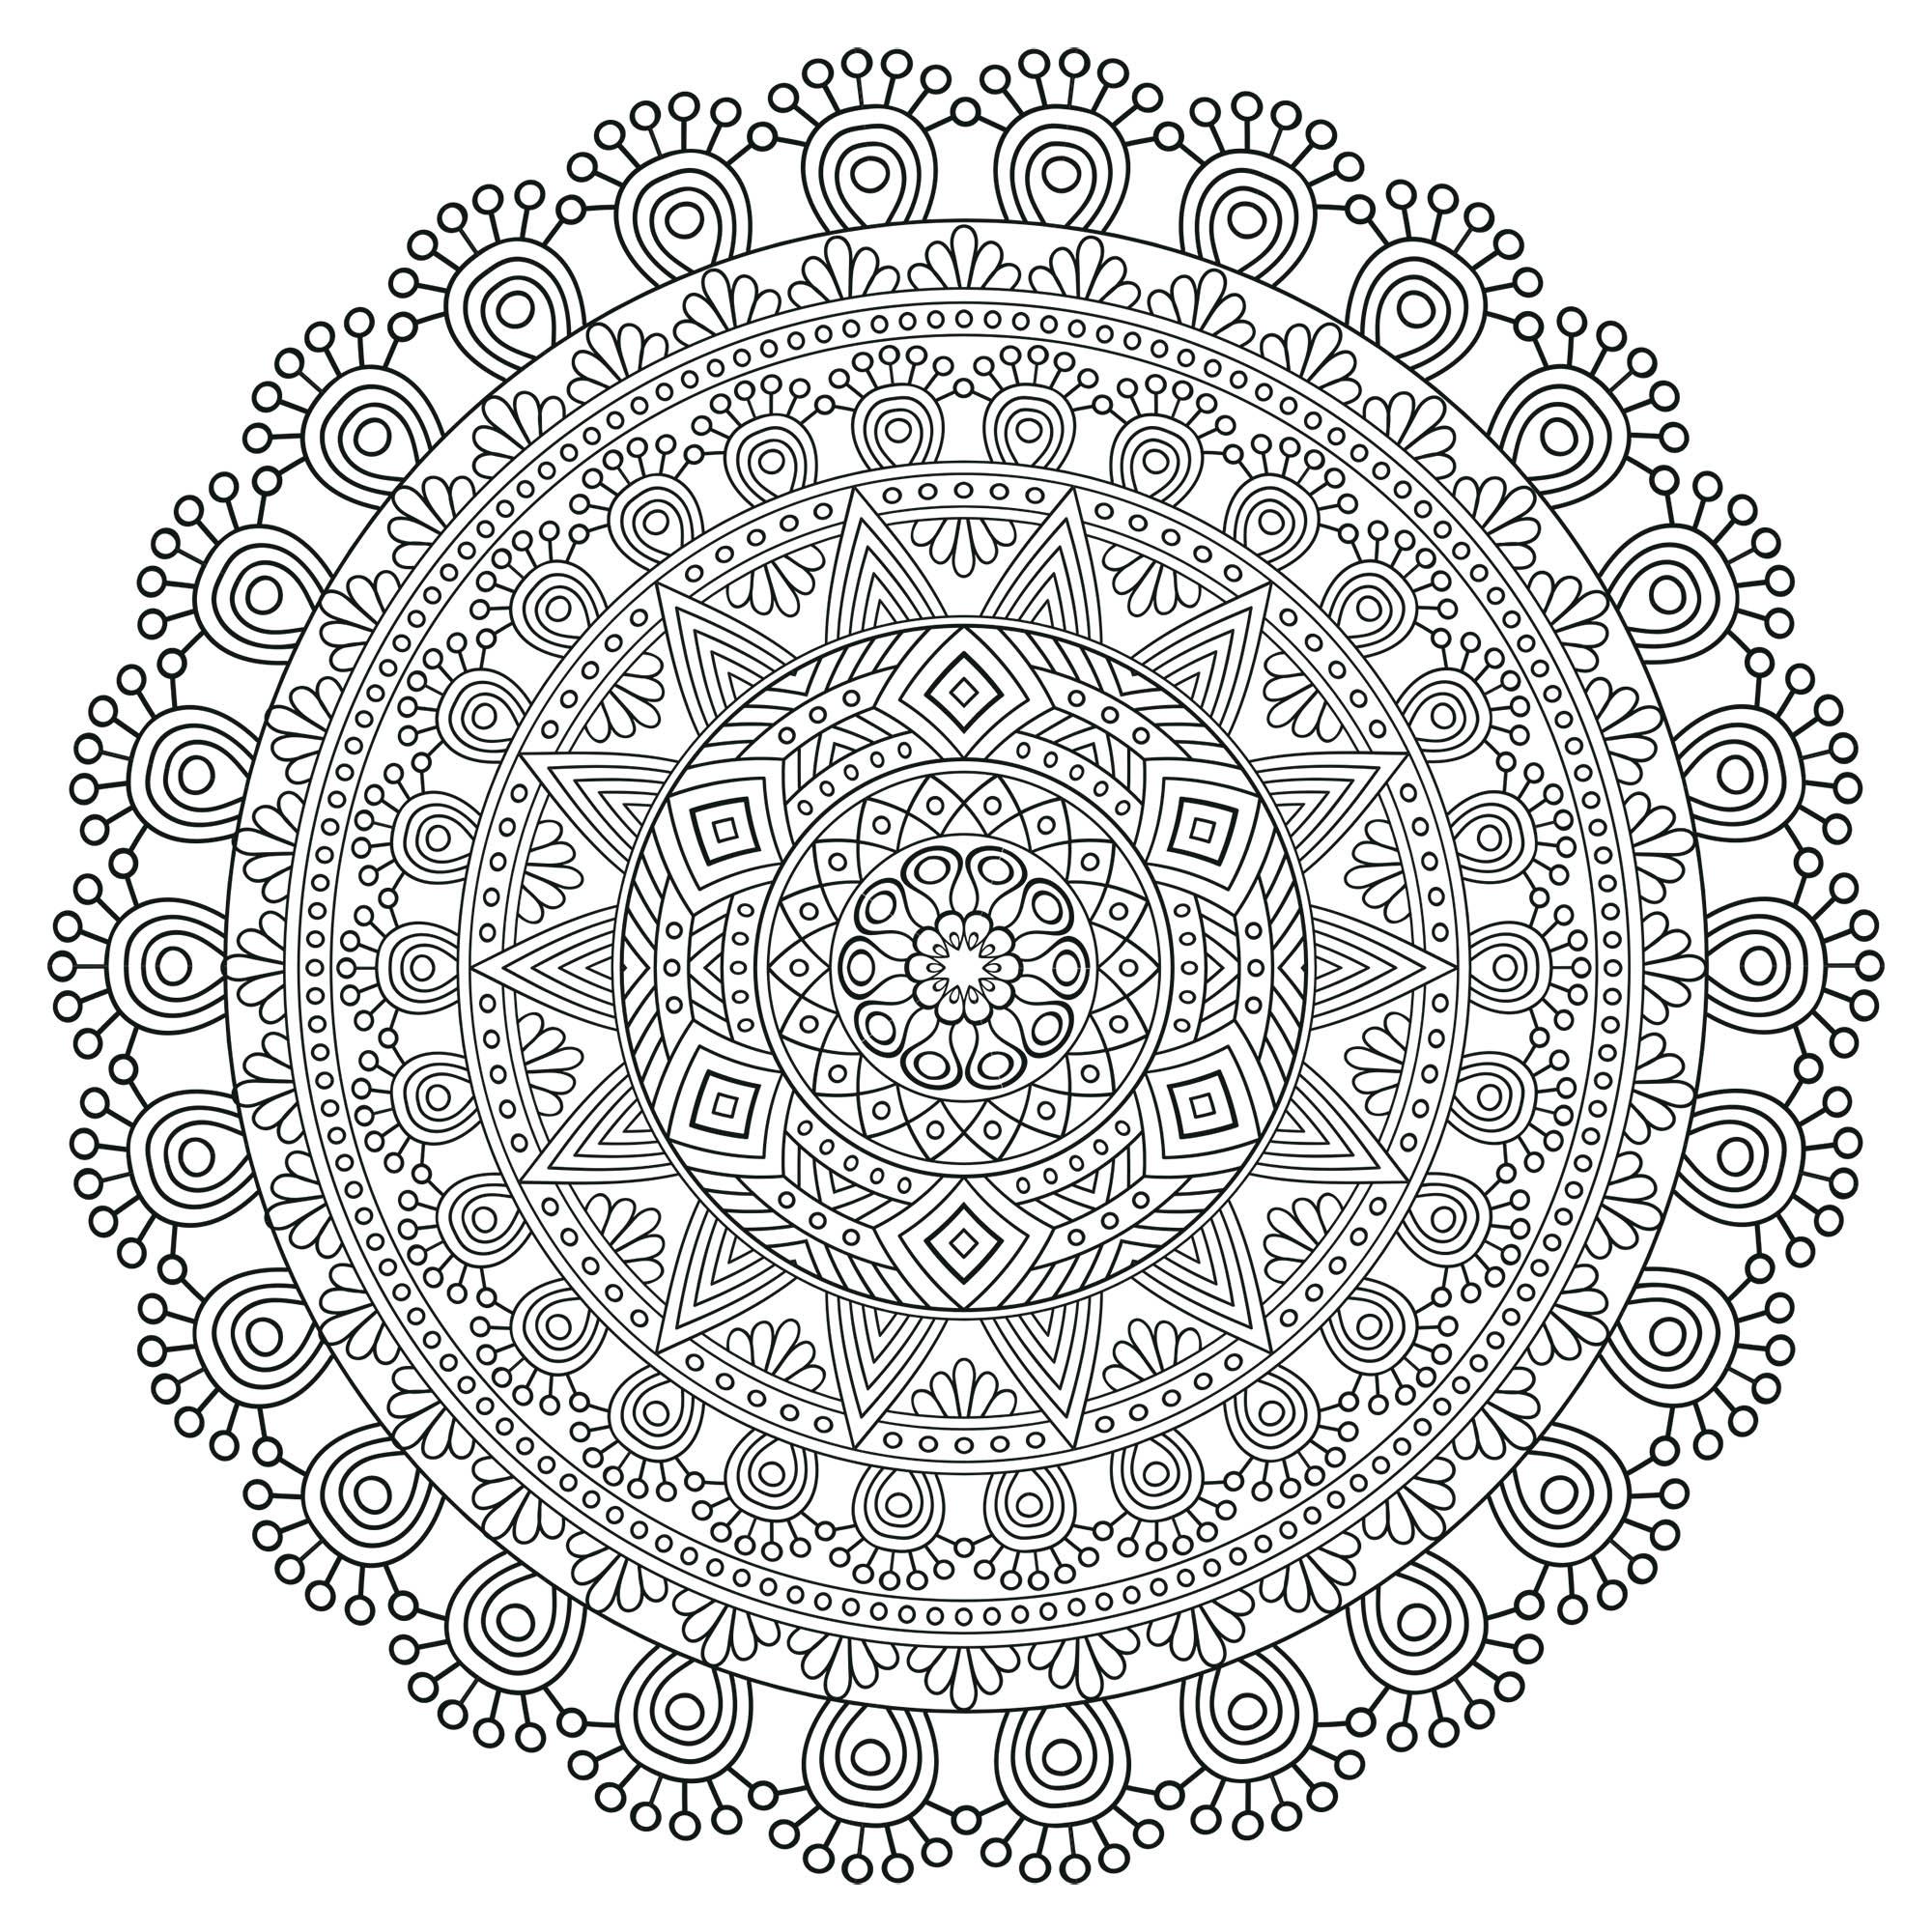 Mandala zen antistress 5 mandalas coloriages - Coloriage adulte a imprimer anti stress ...